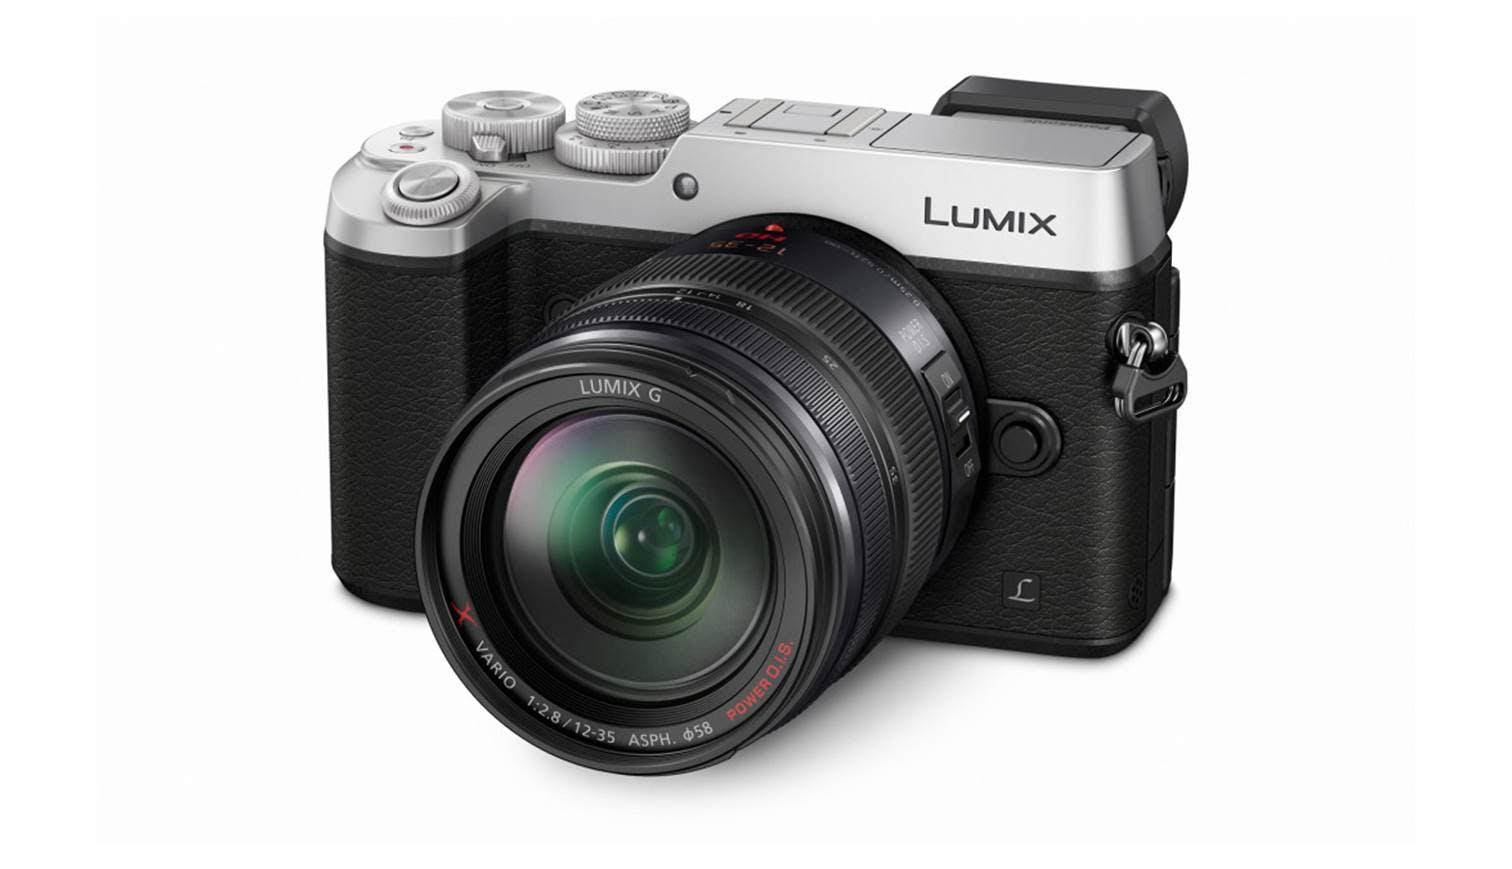 Panasonic Lumix G Dmc Gx8agc S Dslm Camera With 12 35mm Lens Kit X Vario F 28 Asph Power Ois H Hs12035e Silver